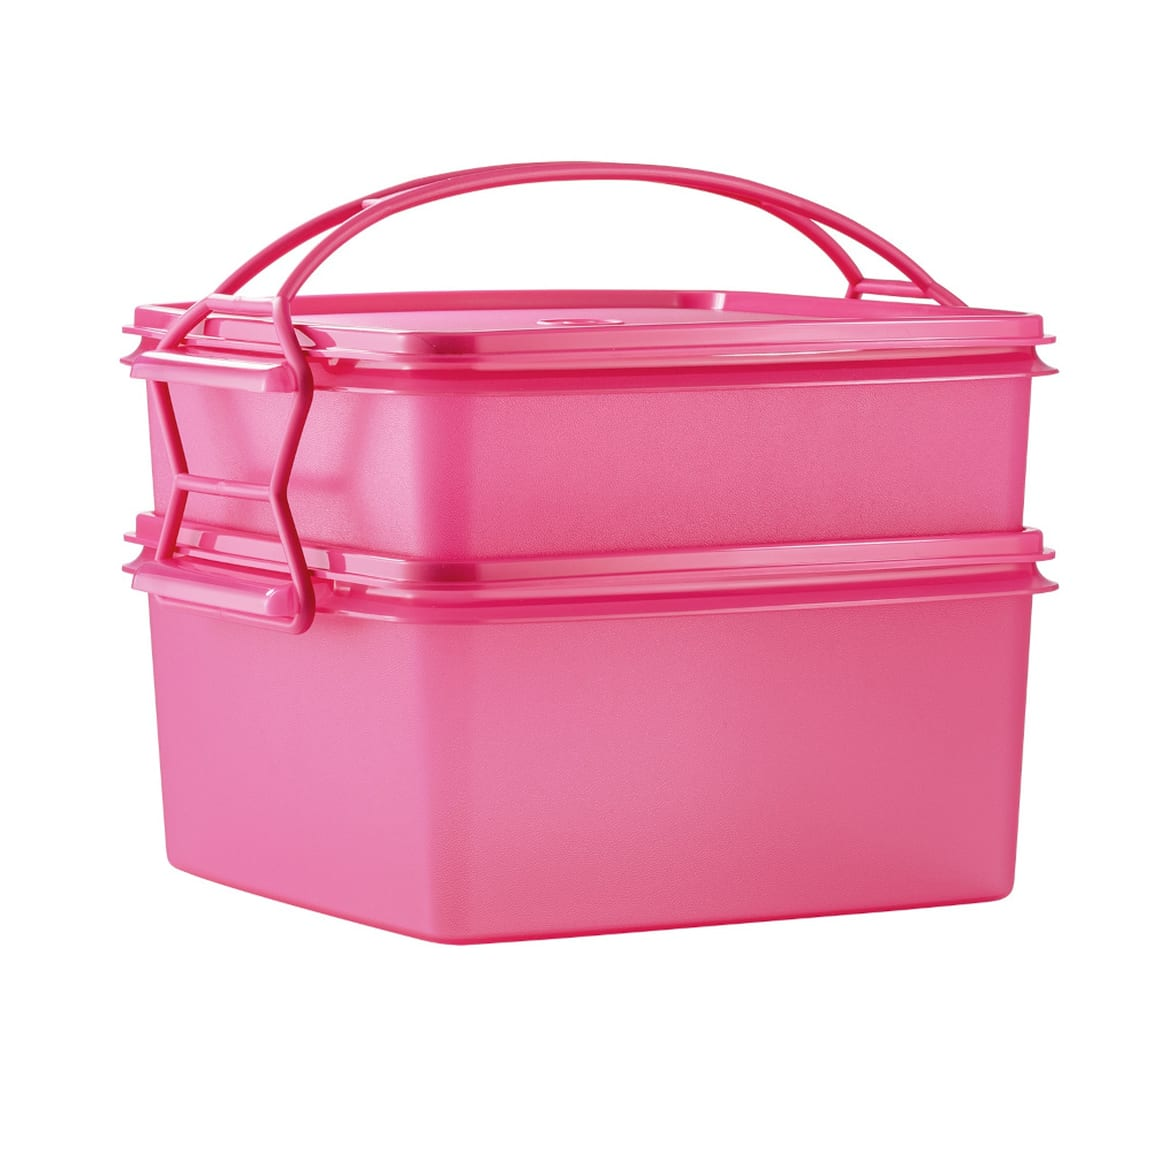 Jumbo Goody Box with Cariolier - PWP